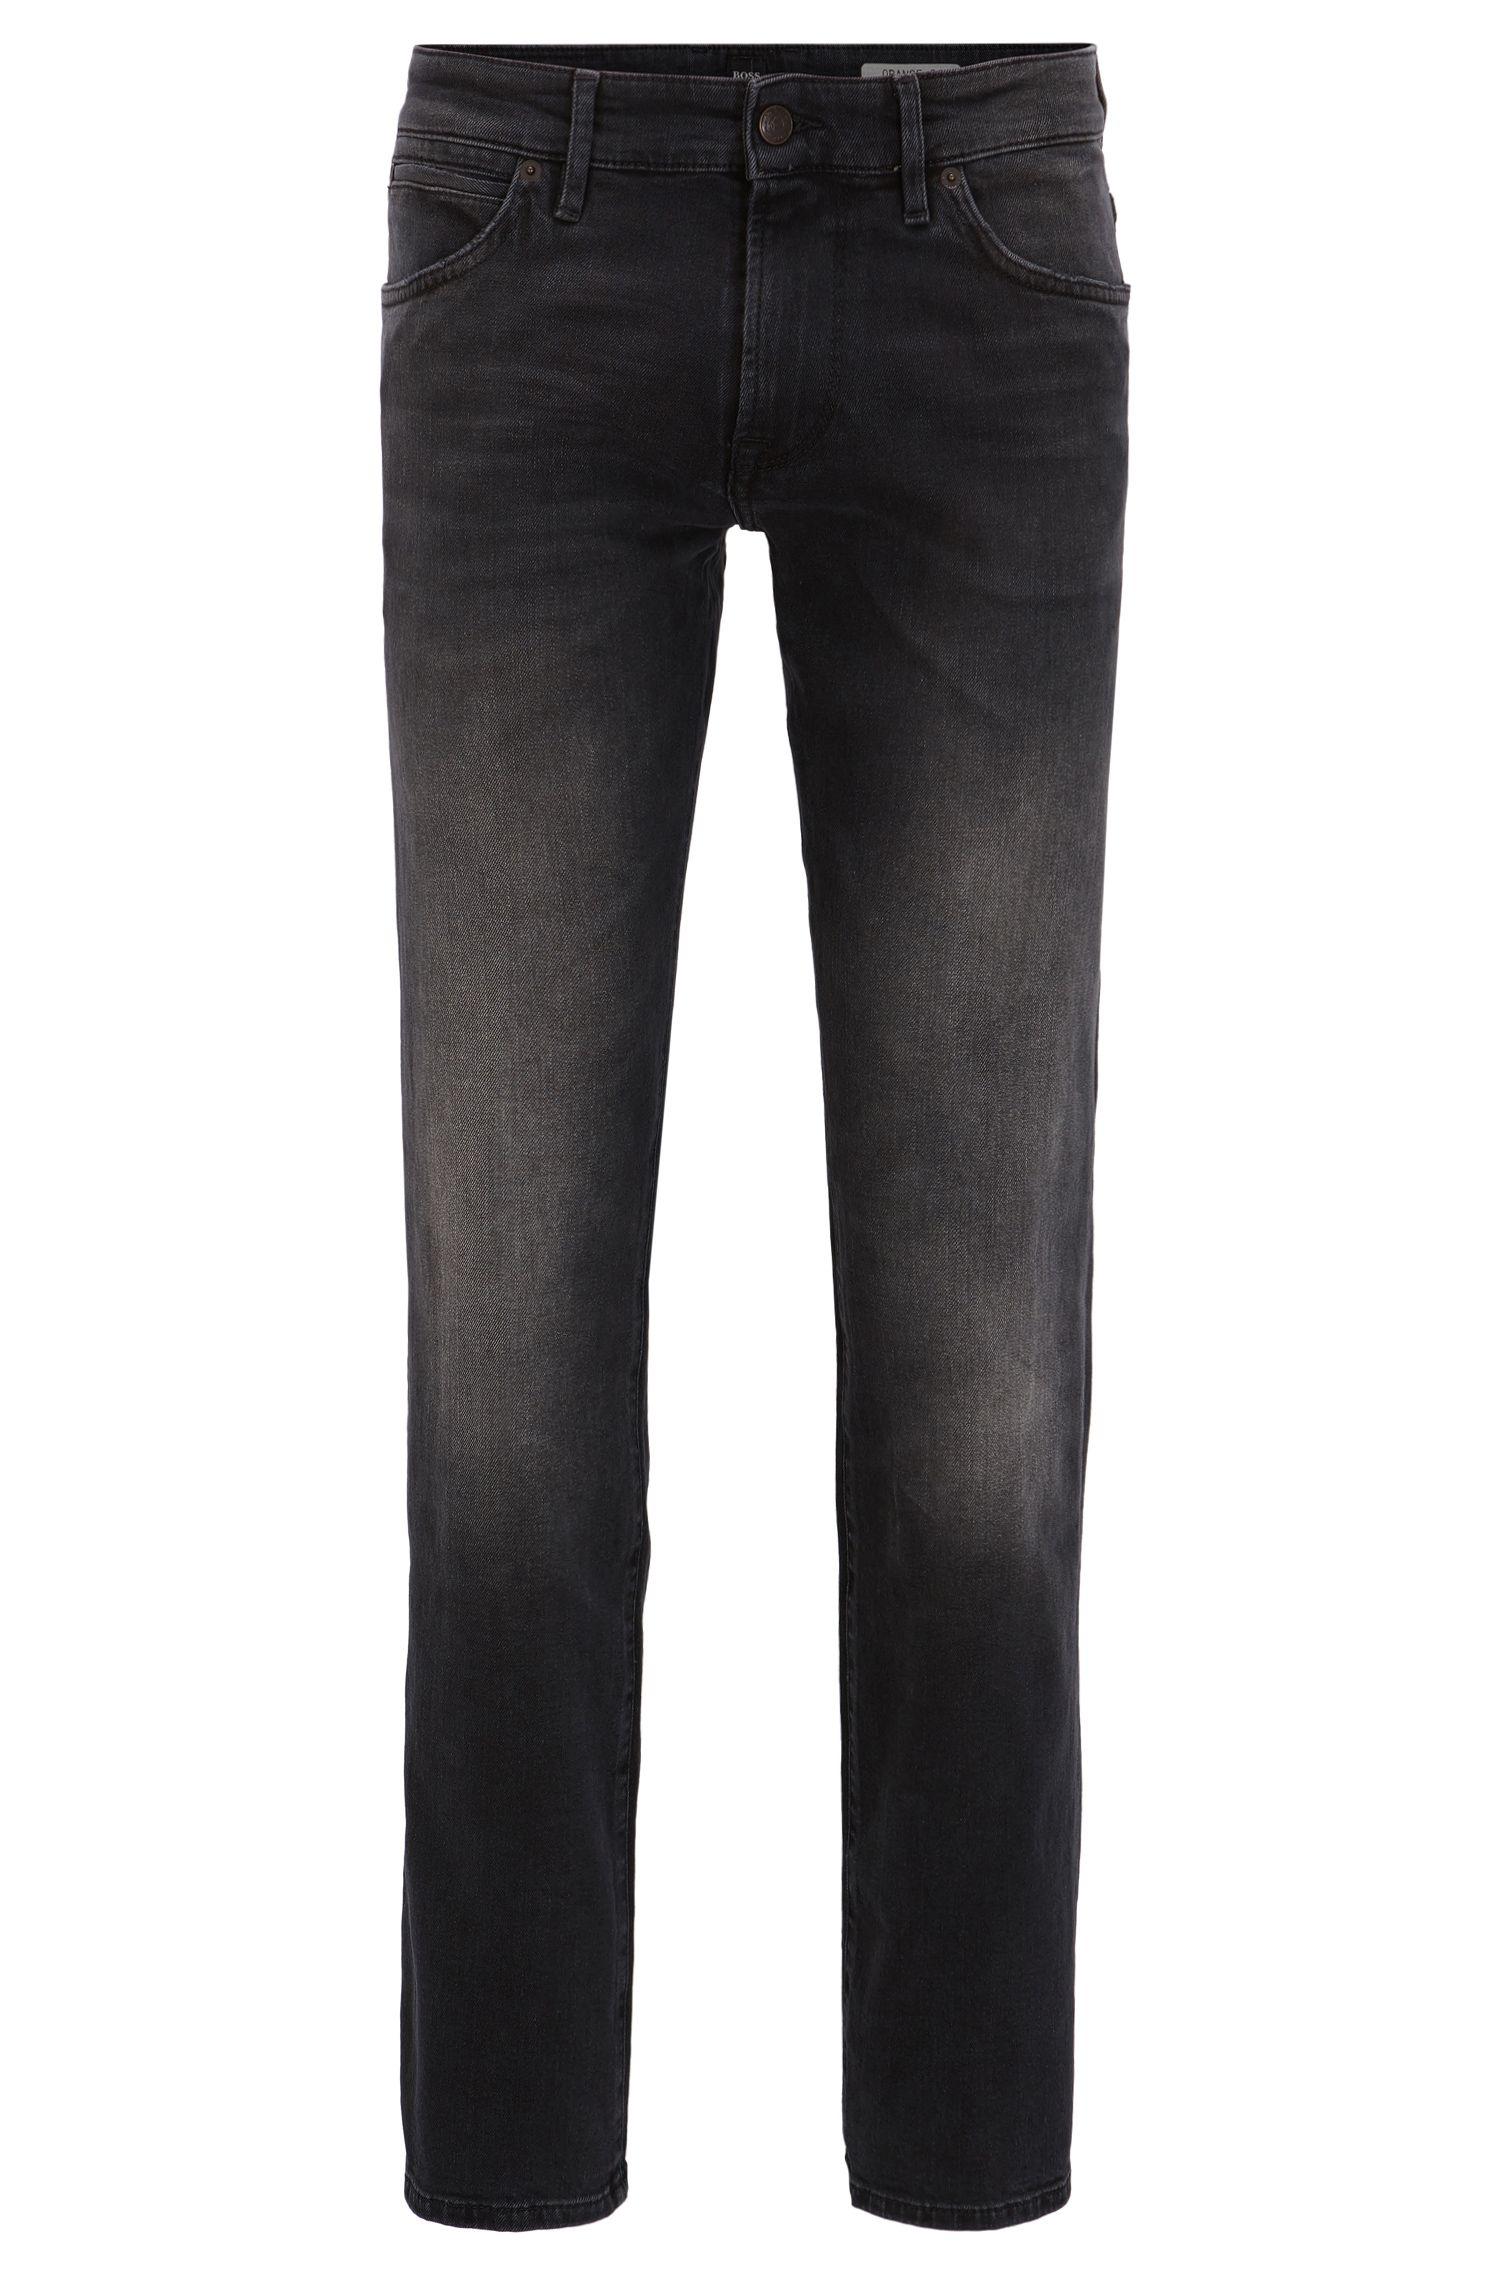 Regular-Fit Jeans aus komfortablem Baumwoll-Mix mit Elasthan